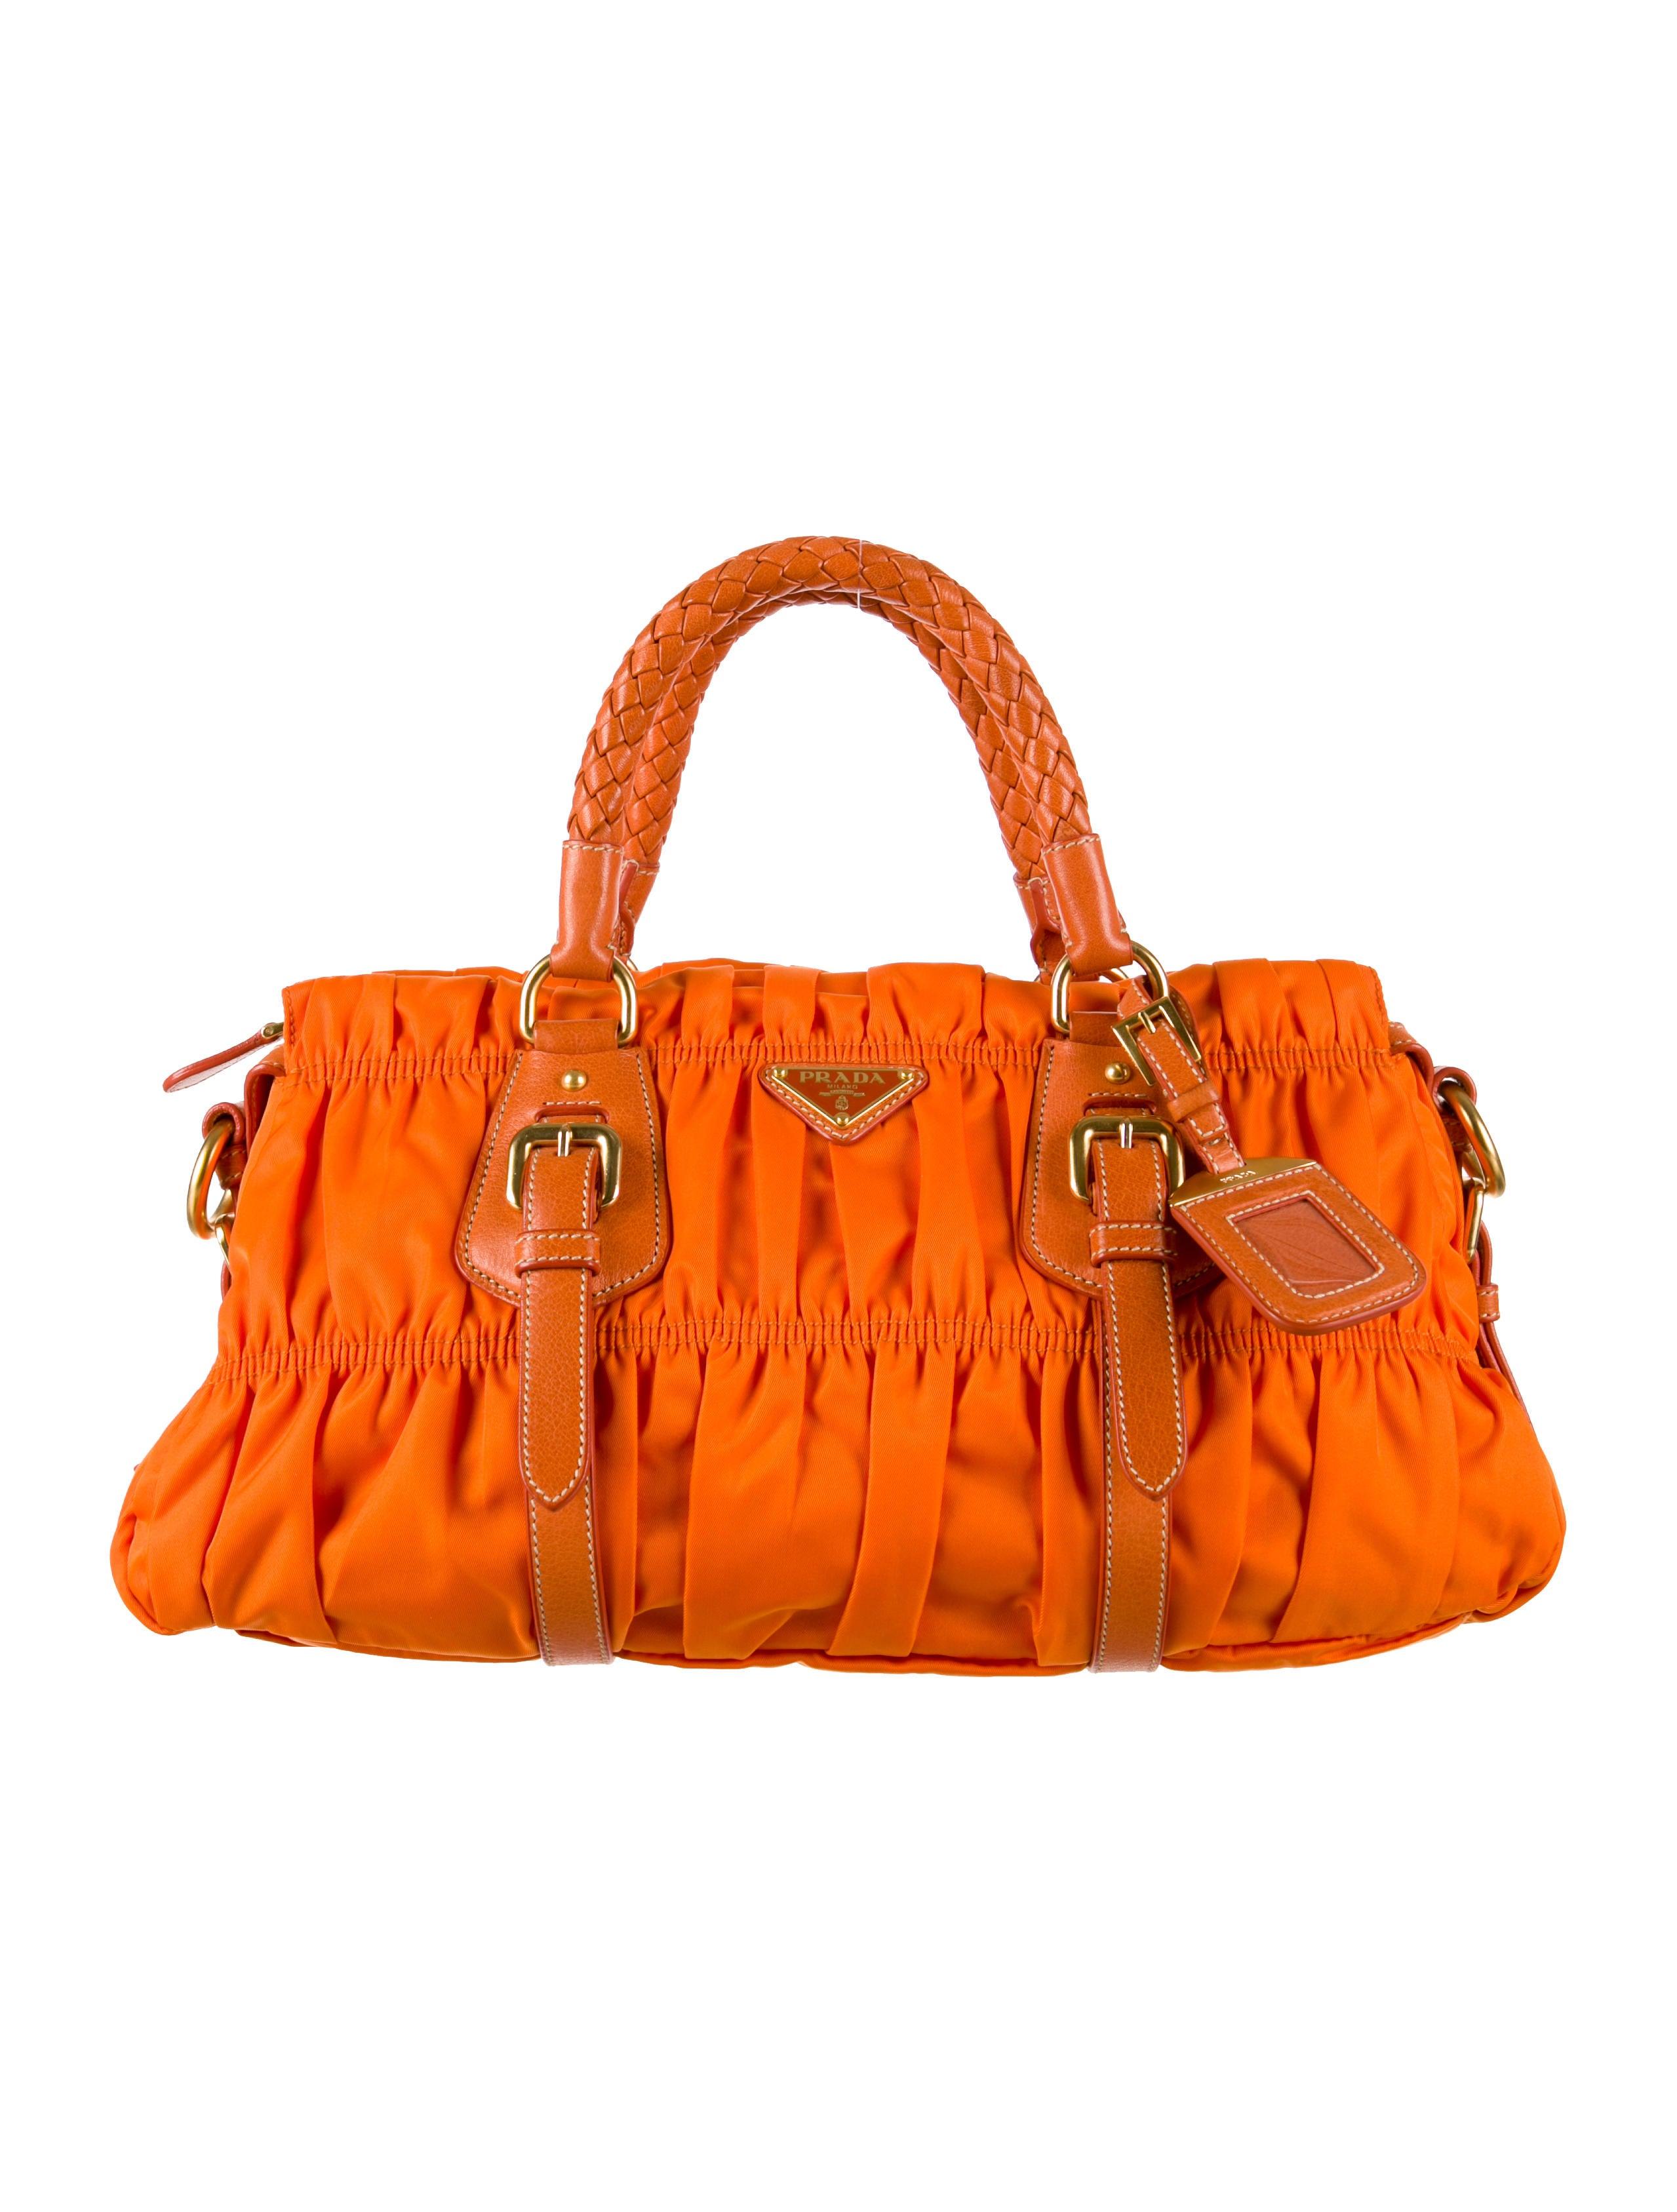 135d9d2e791f Prada Tessuto Gaufre Satchel w/ Tags - Handbags - PRA62161   The ...